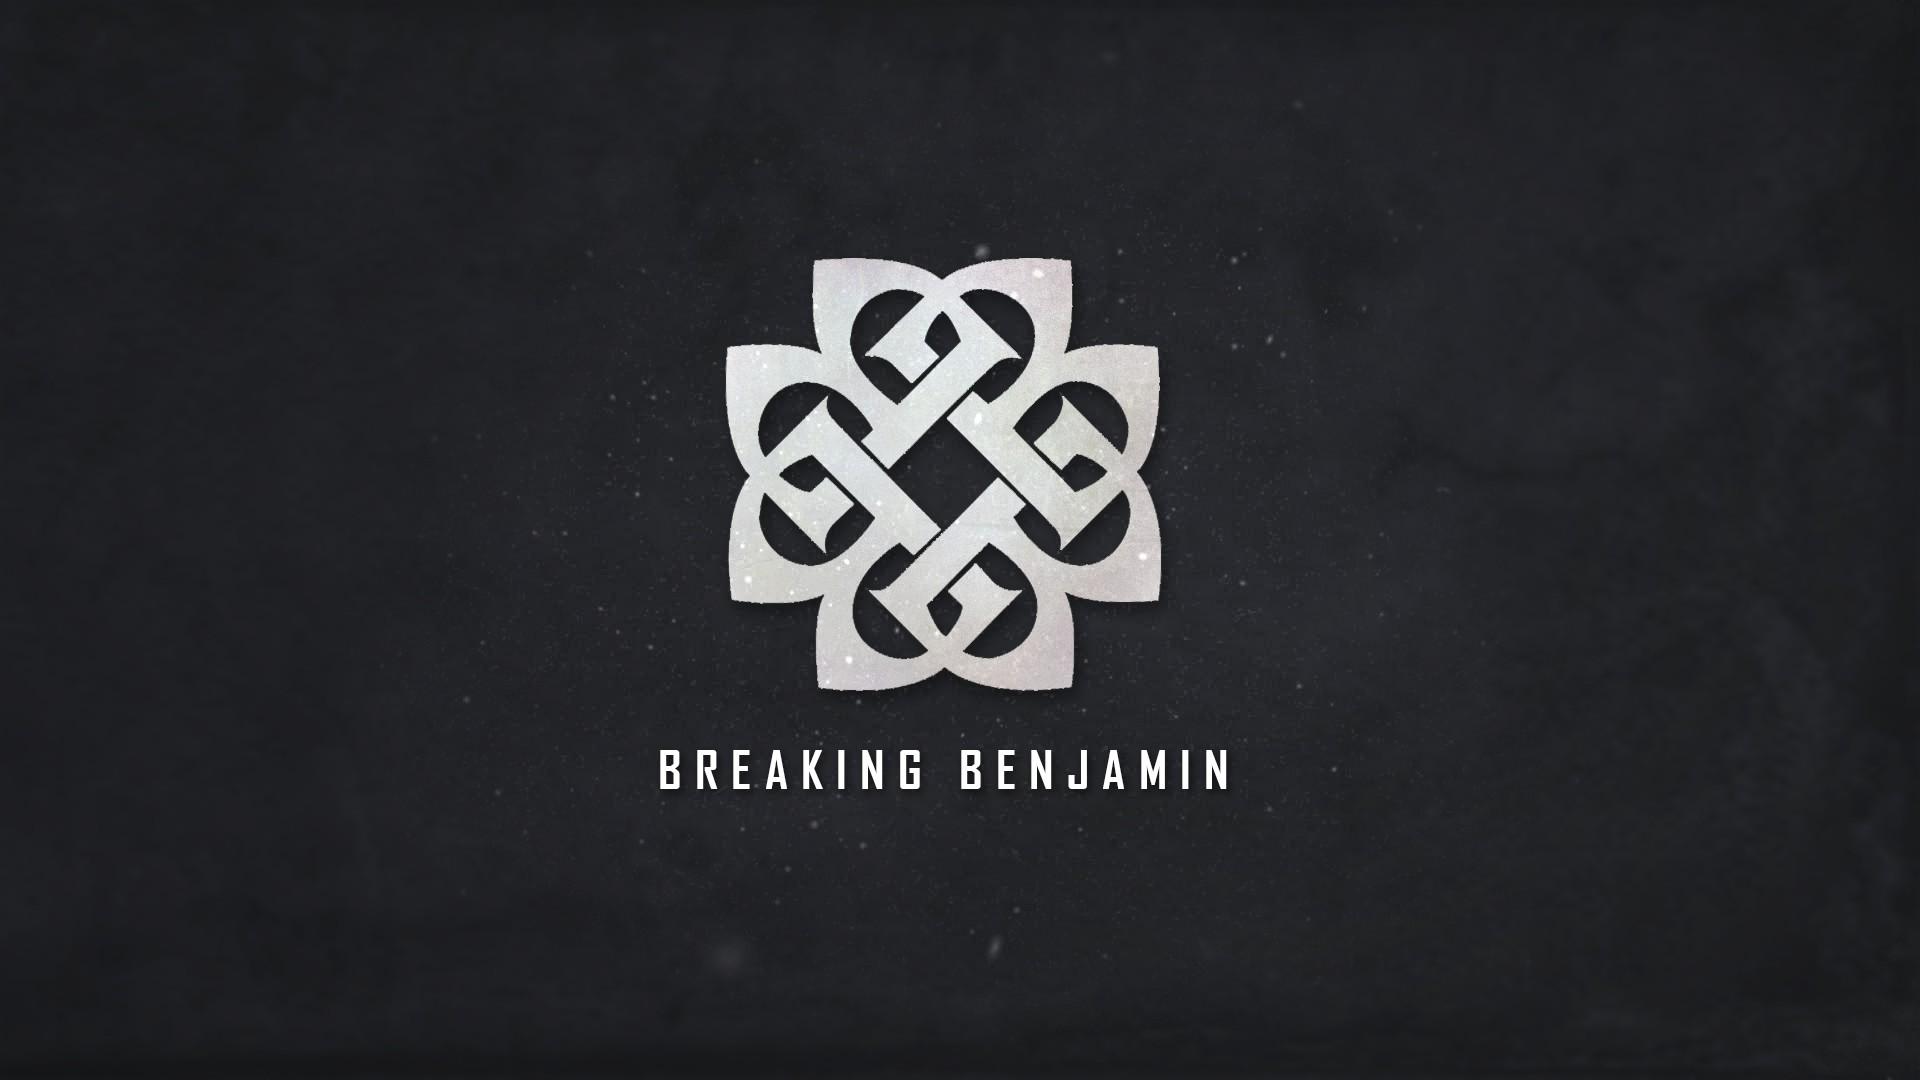 1920x1080 Px Breaking Benjamin